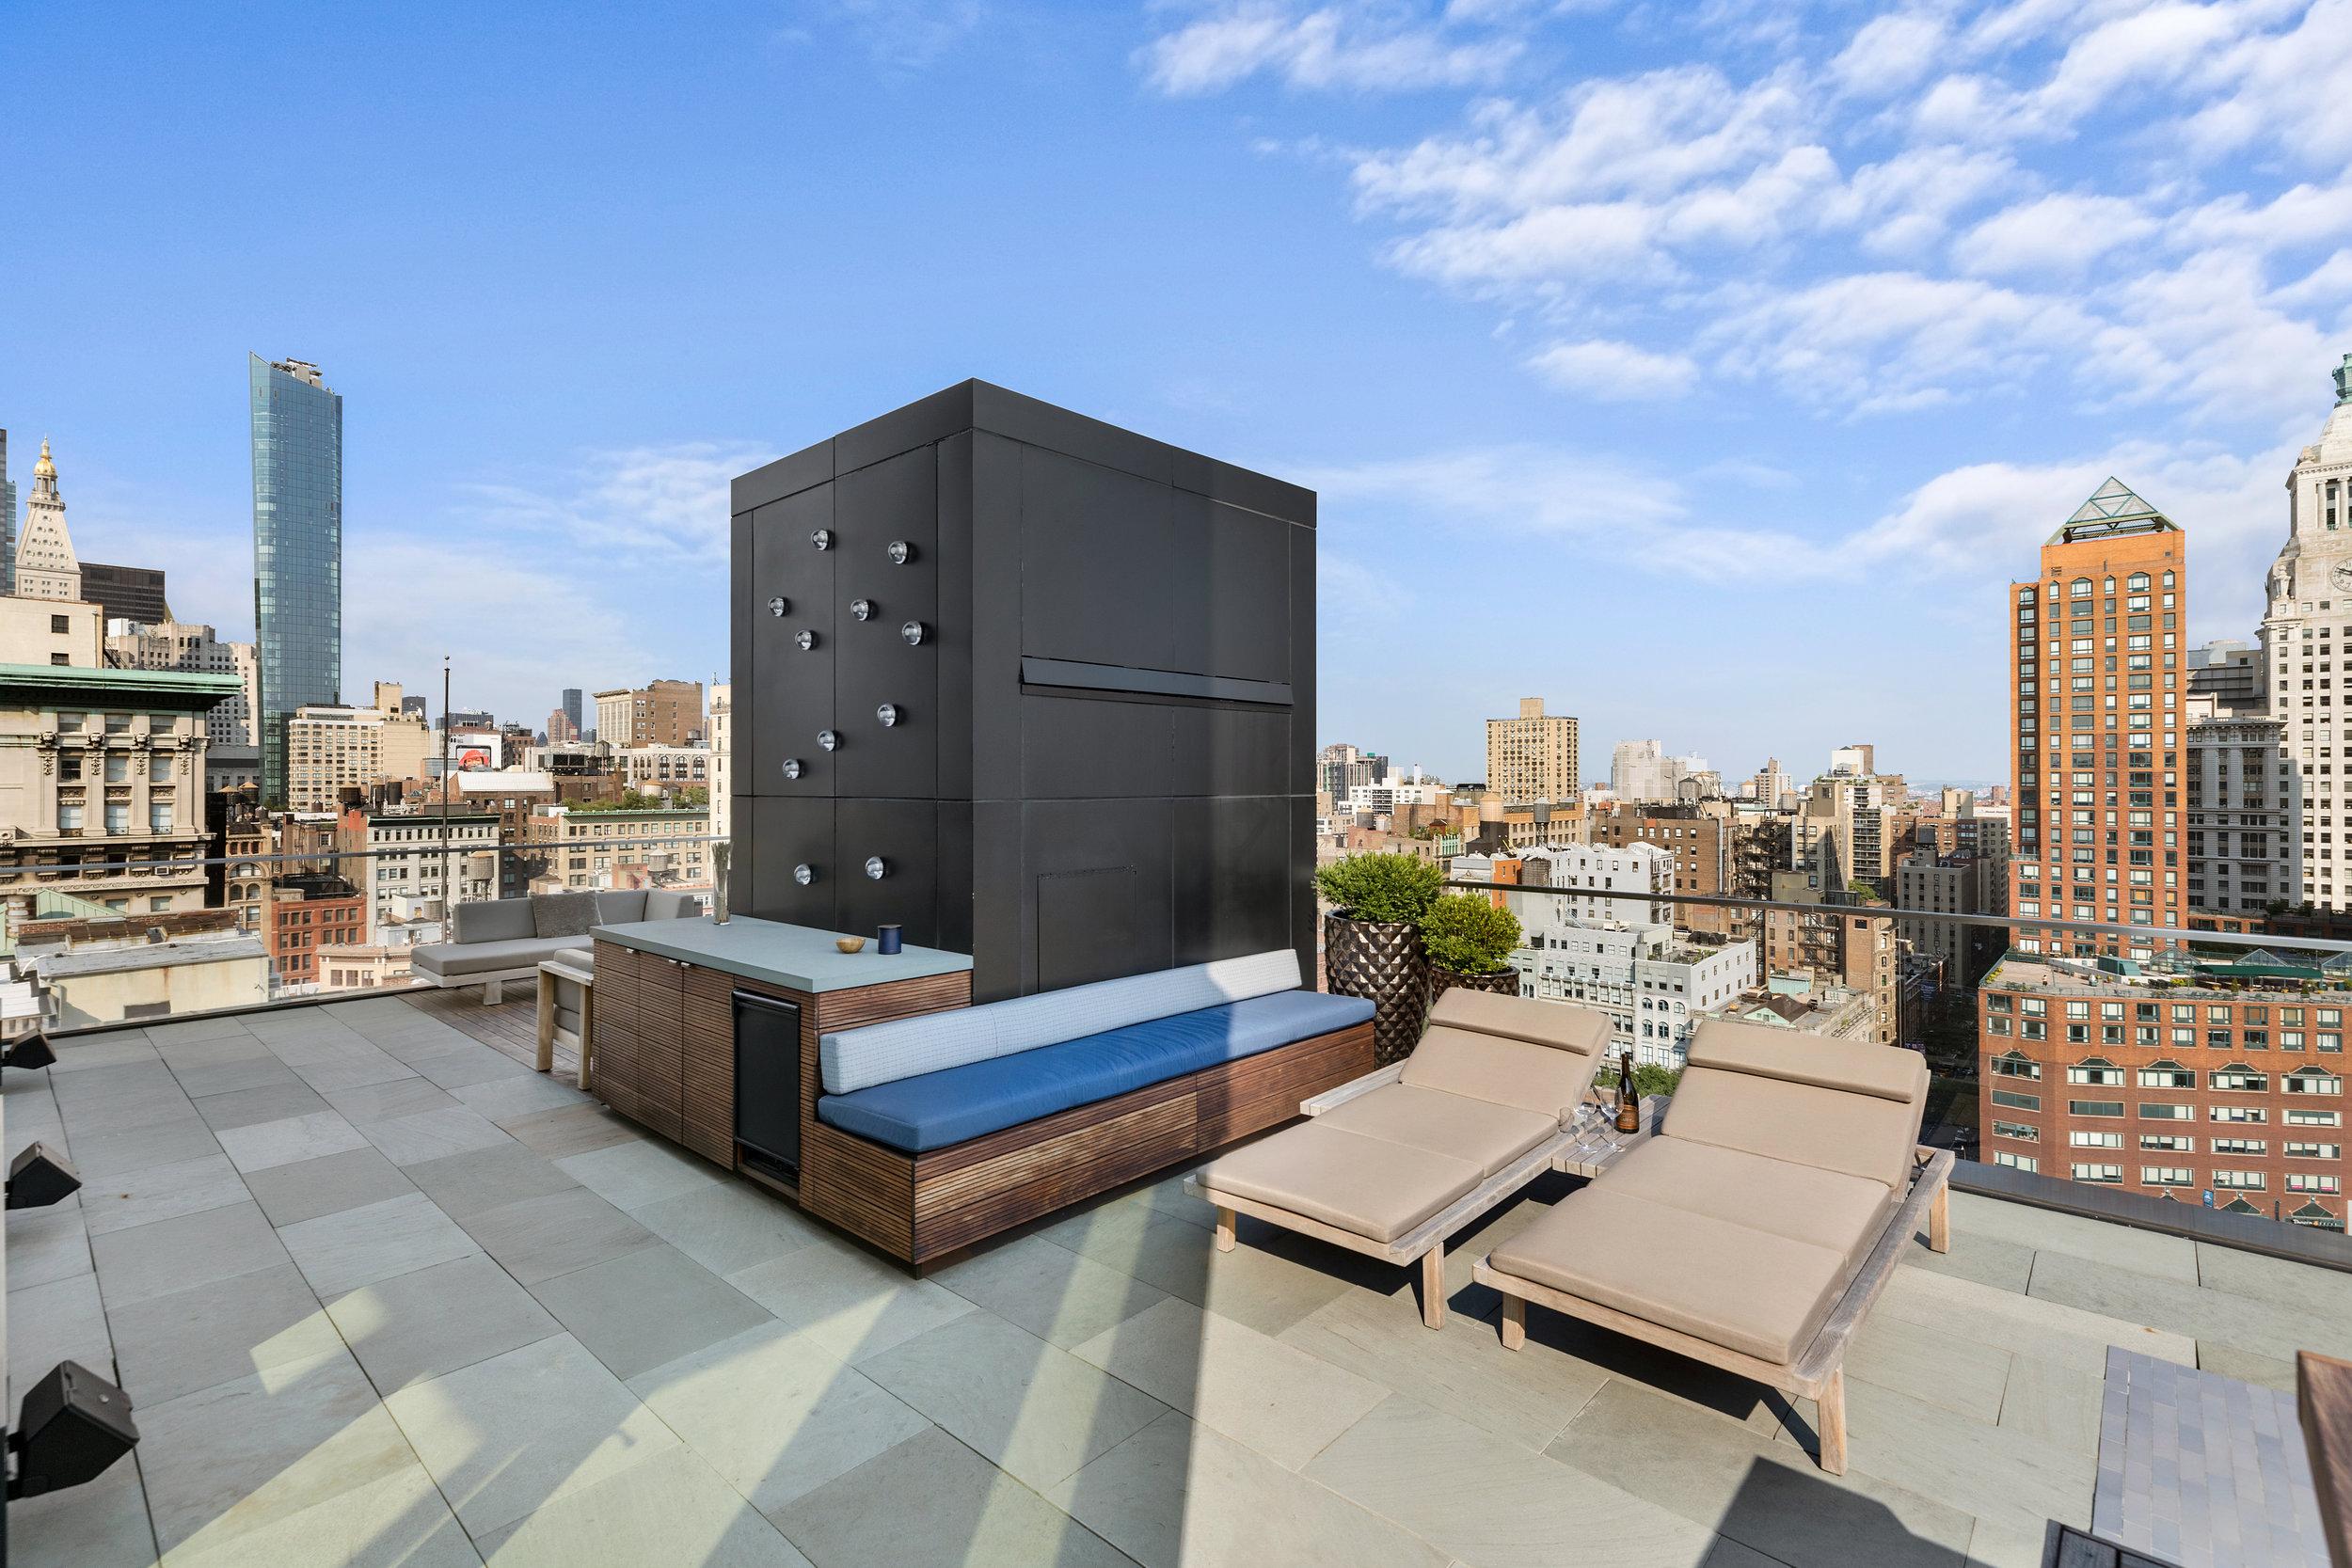 15 Union Square W New York NY - Josh Goetz Photography -13.JPG